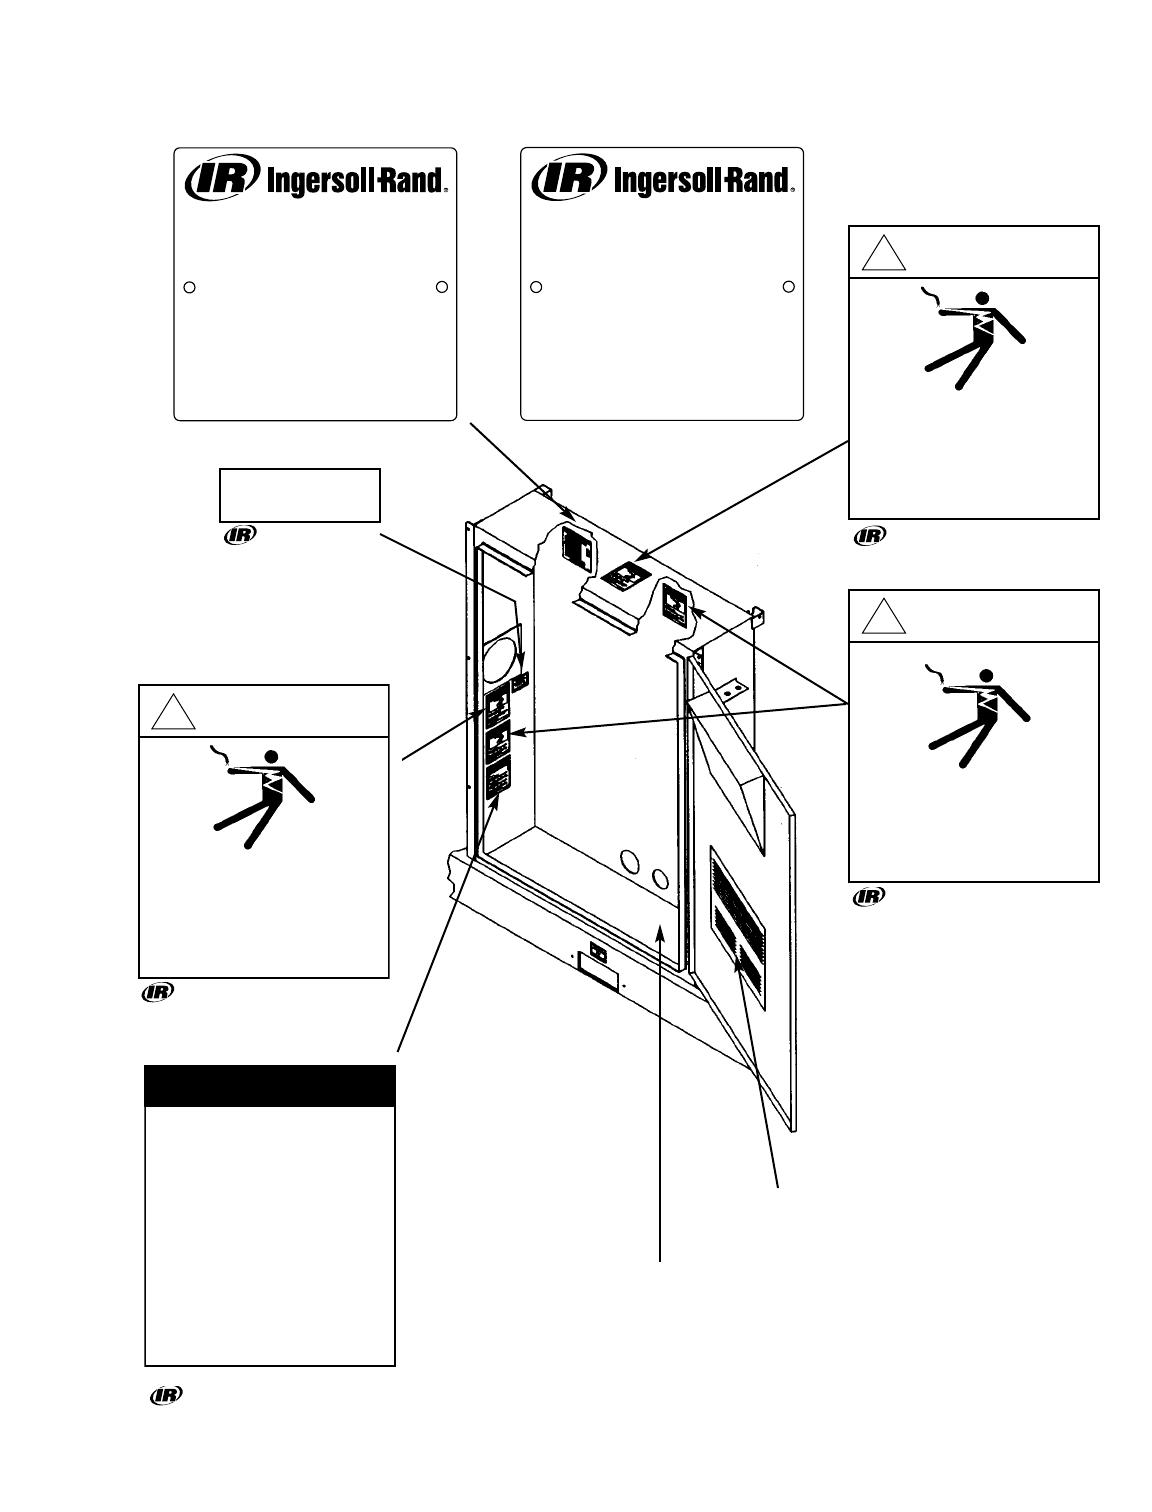 Manual Sym Vs 125